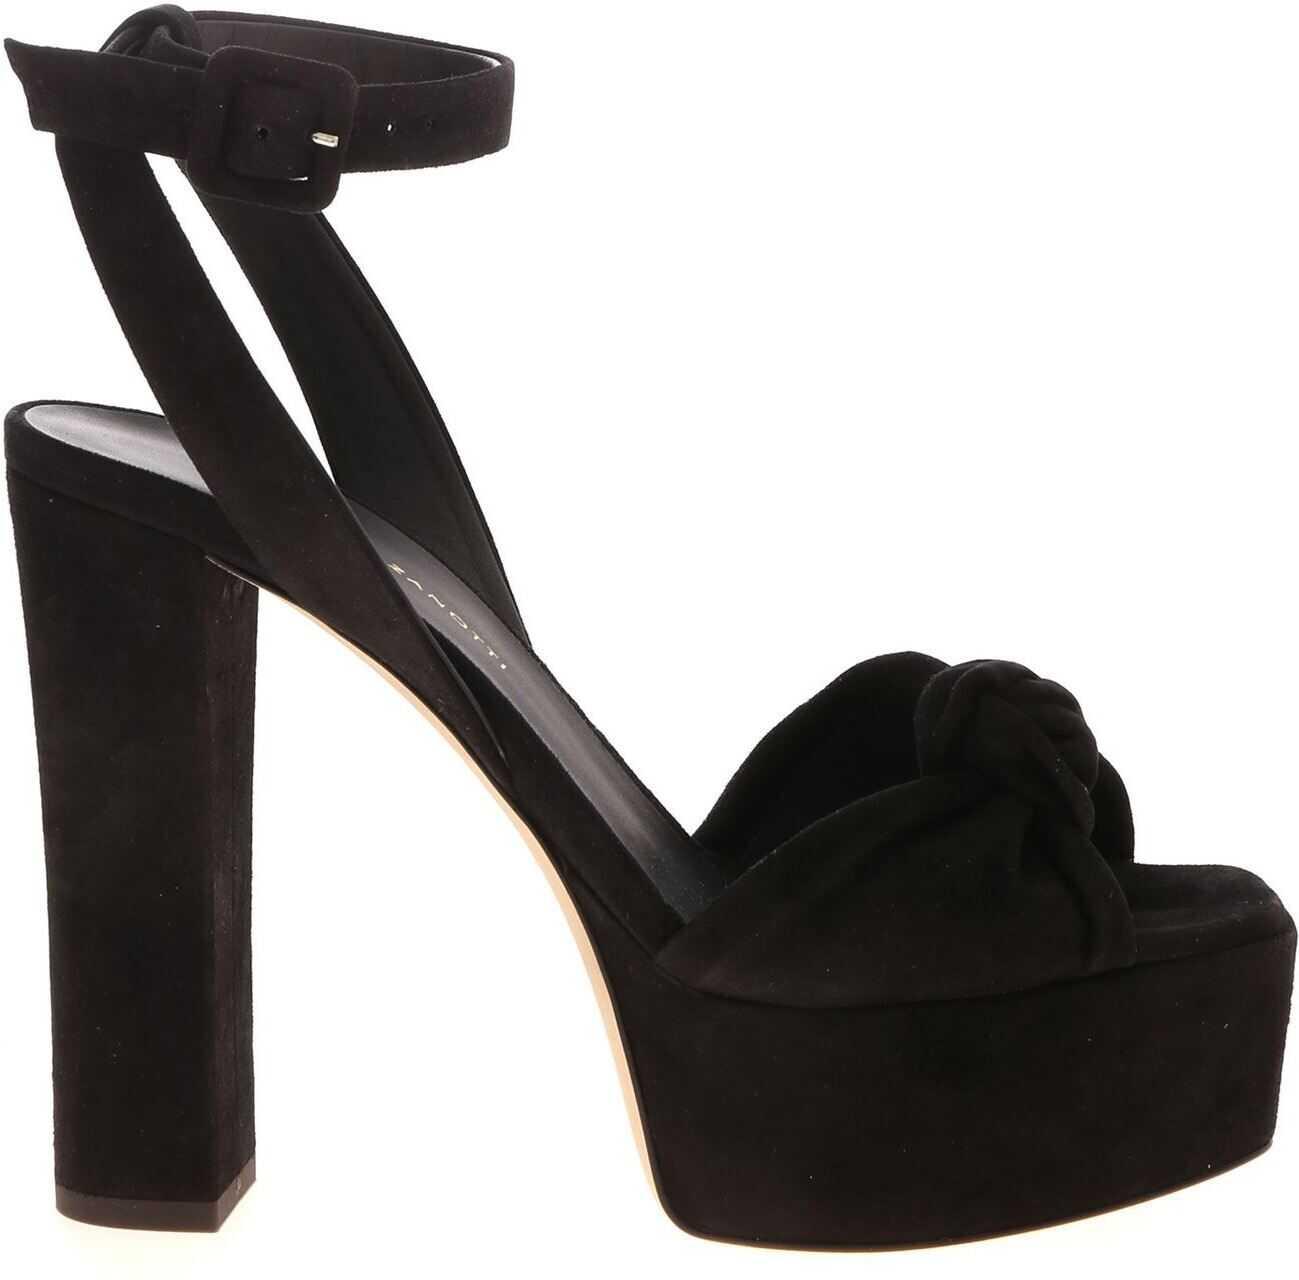 Giuseppe Zanotti Betty Open Toe Sandals In Black Black